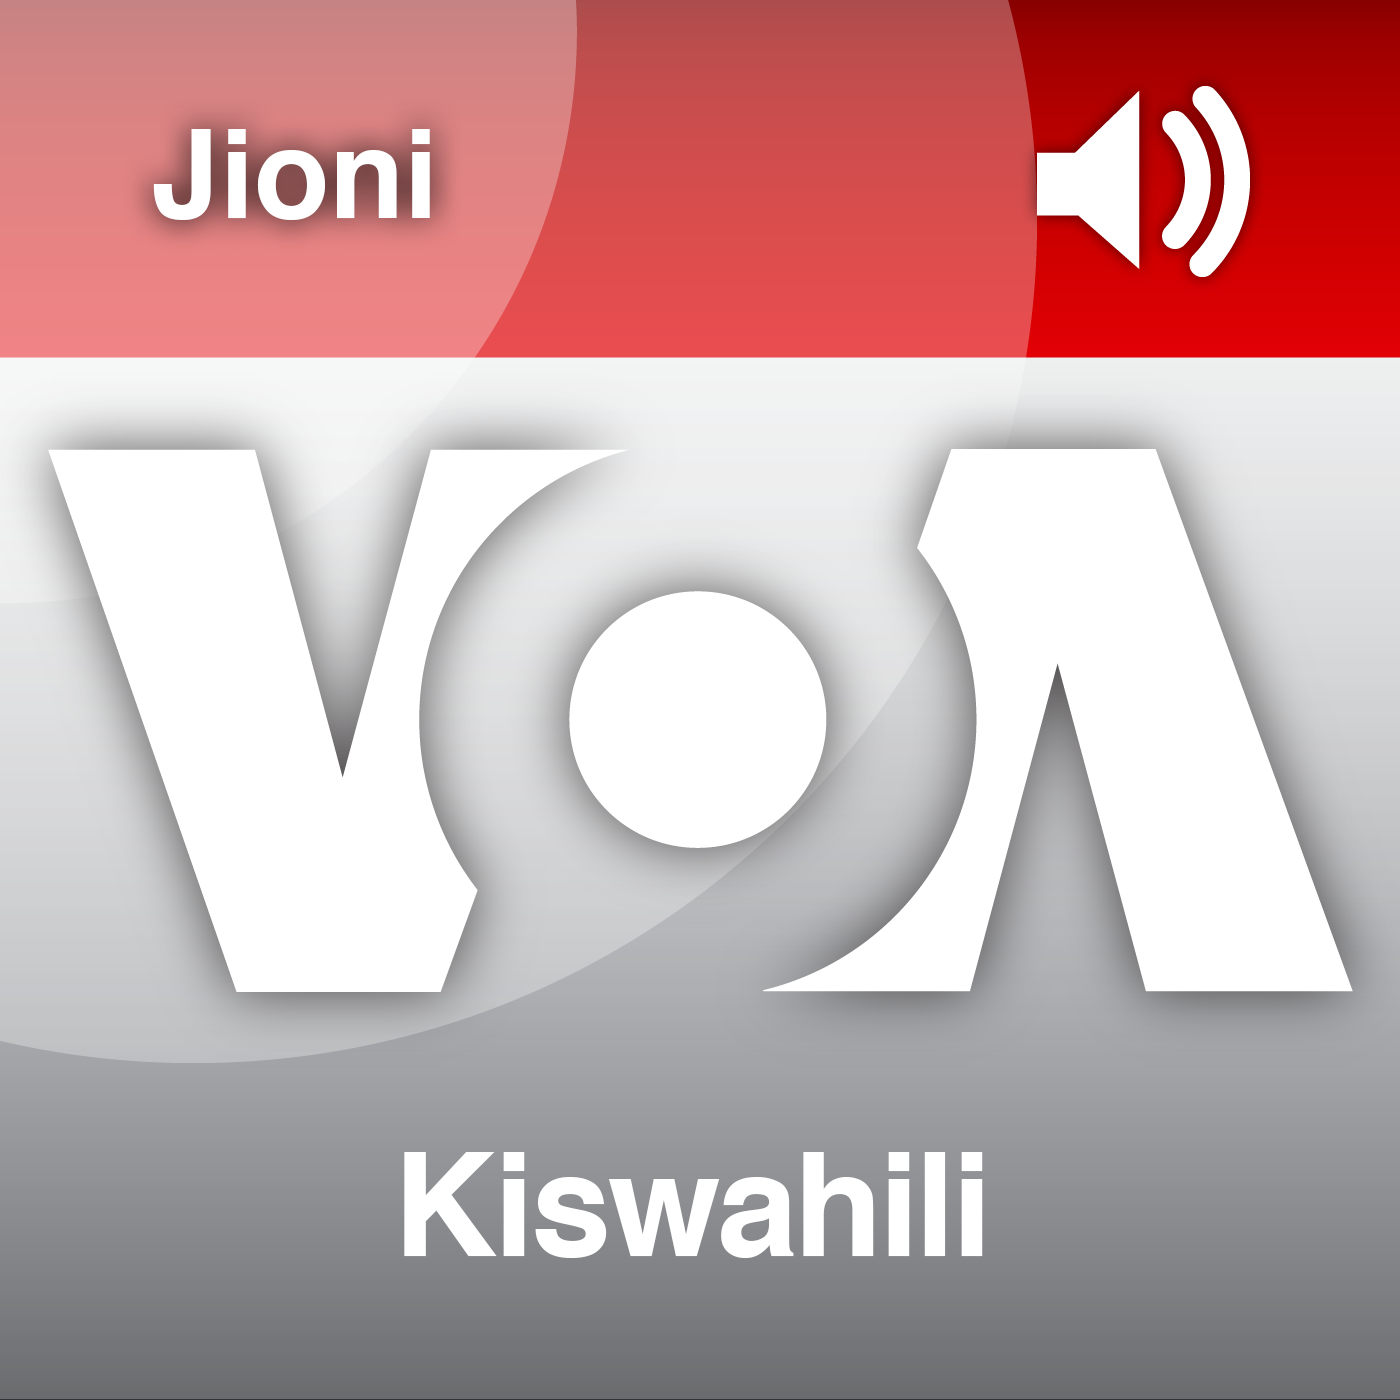 VOA Mitaani - Voice of America